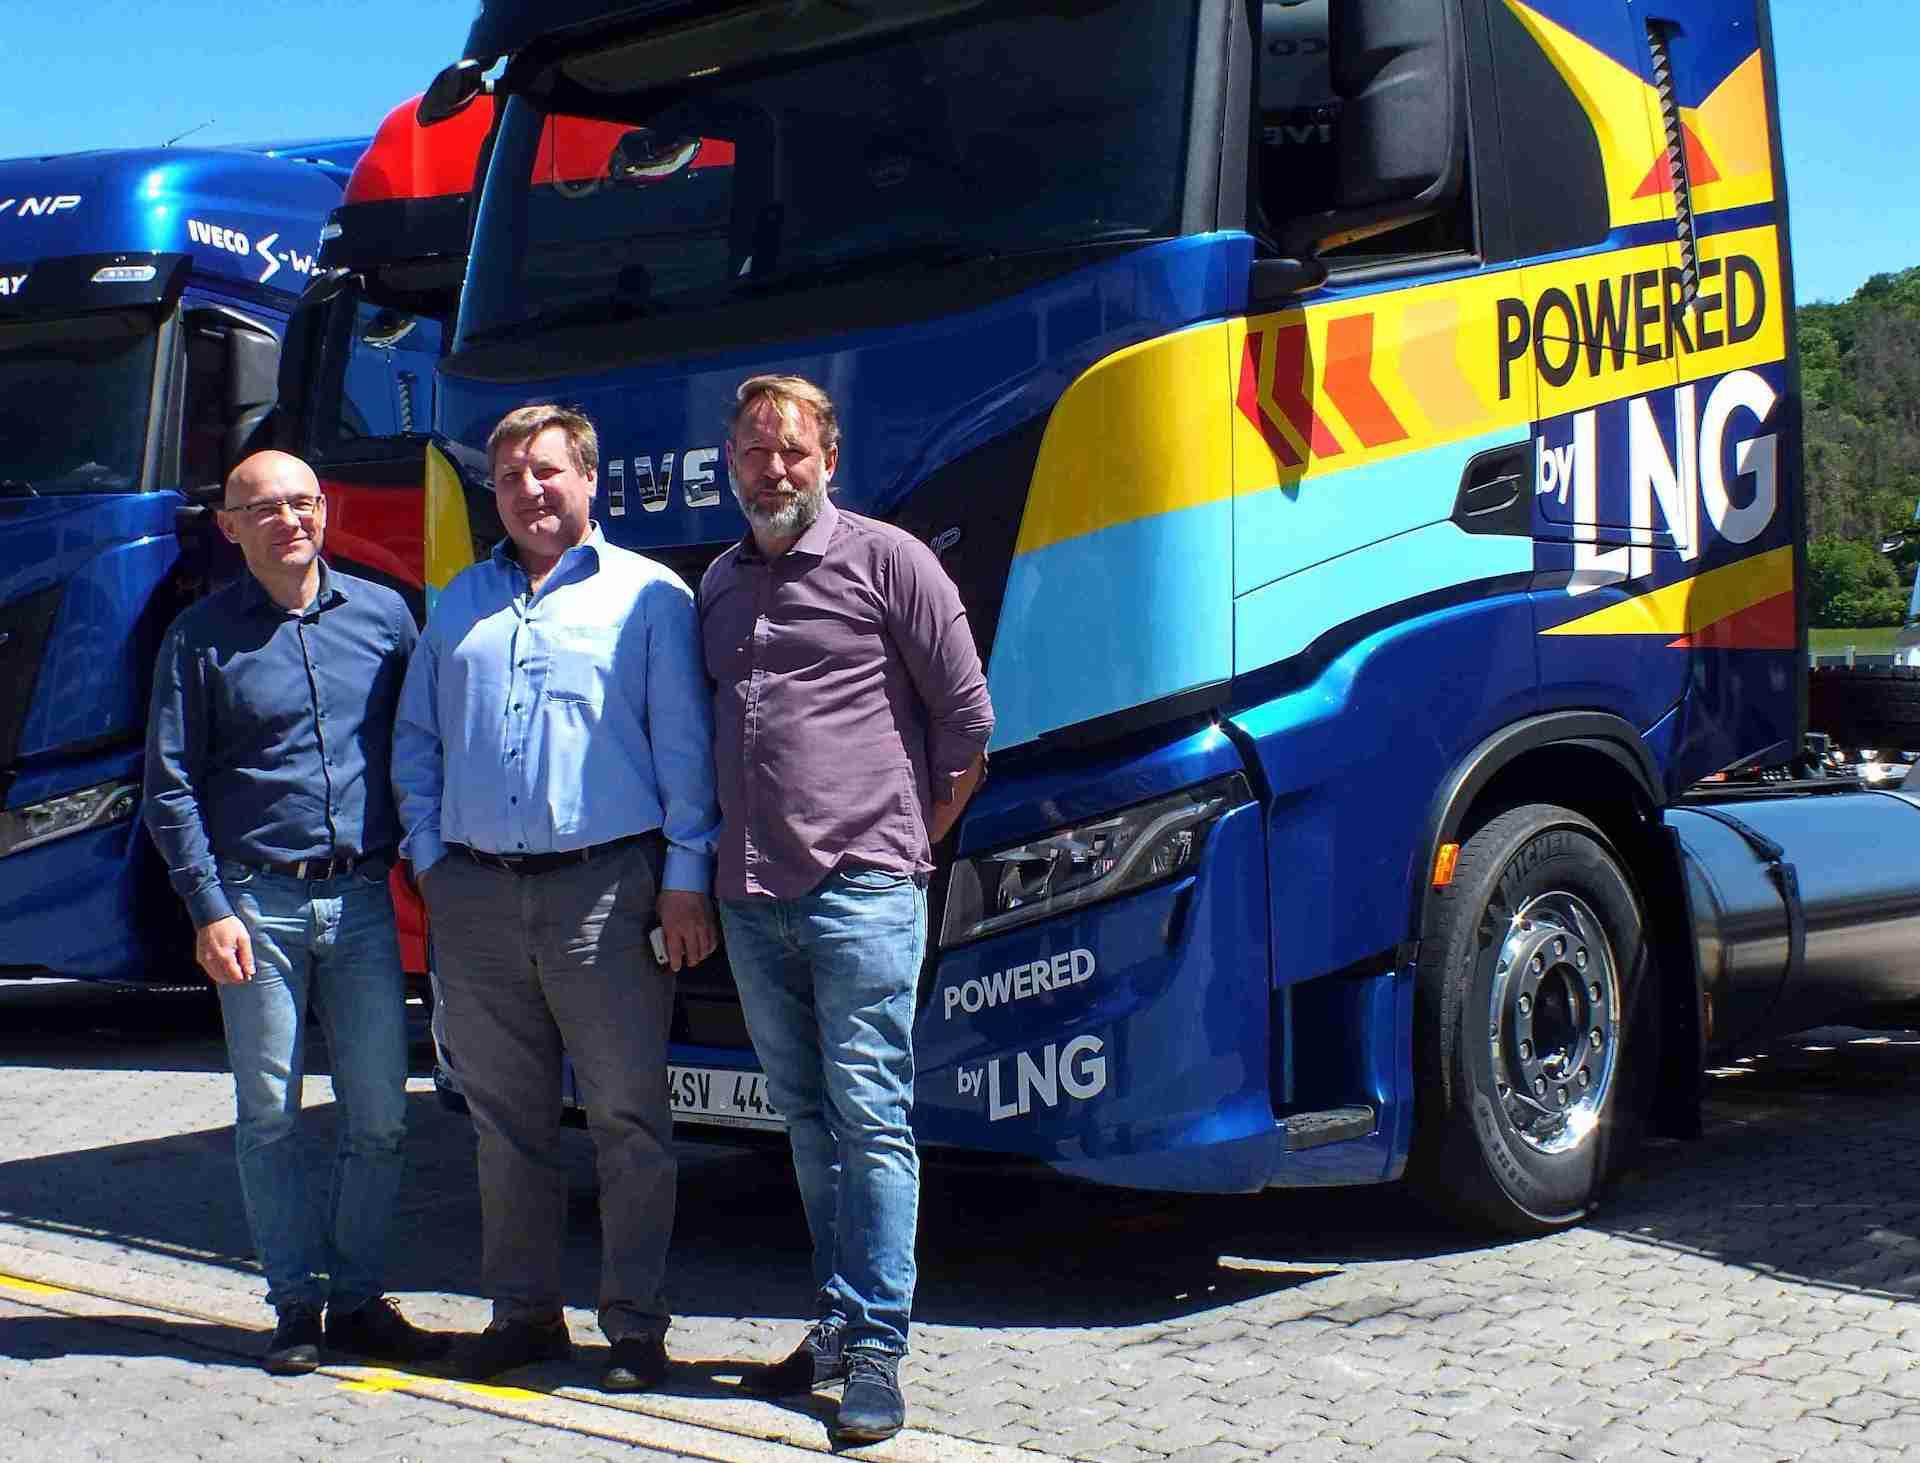 Zleva: Petr Cieslar - generální ředitel Iveco Truck Centra, Igor Brik - jednatel společnosti Spolgas, Miloš Vrbka - Key Account Manager ITC